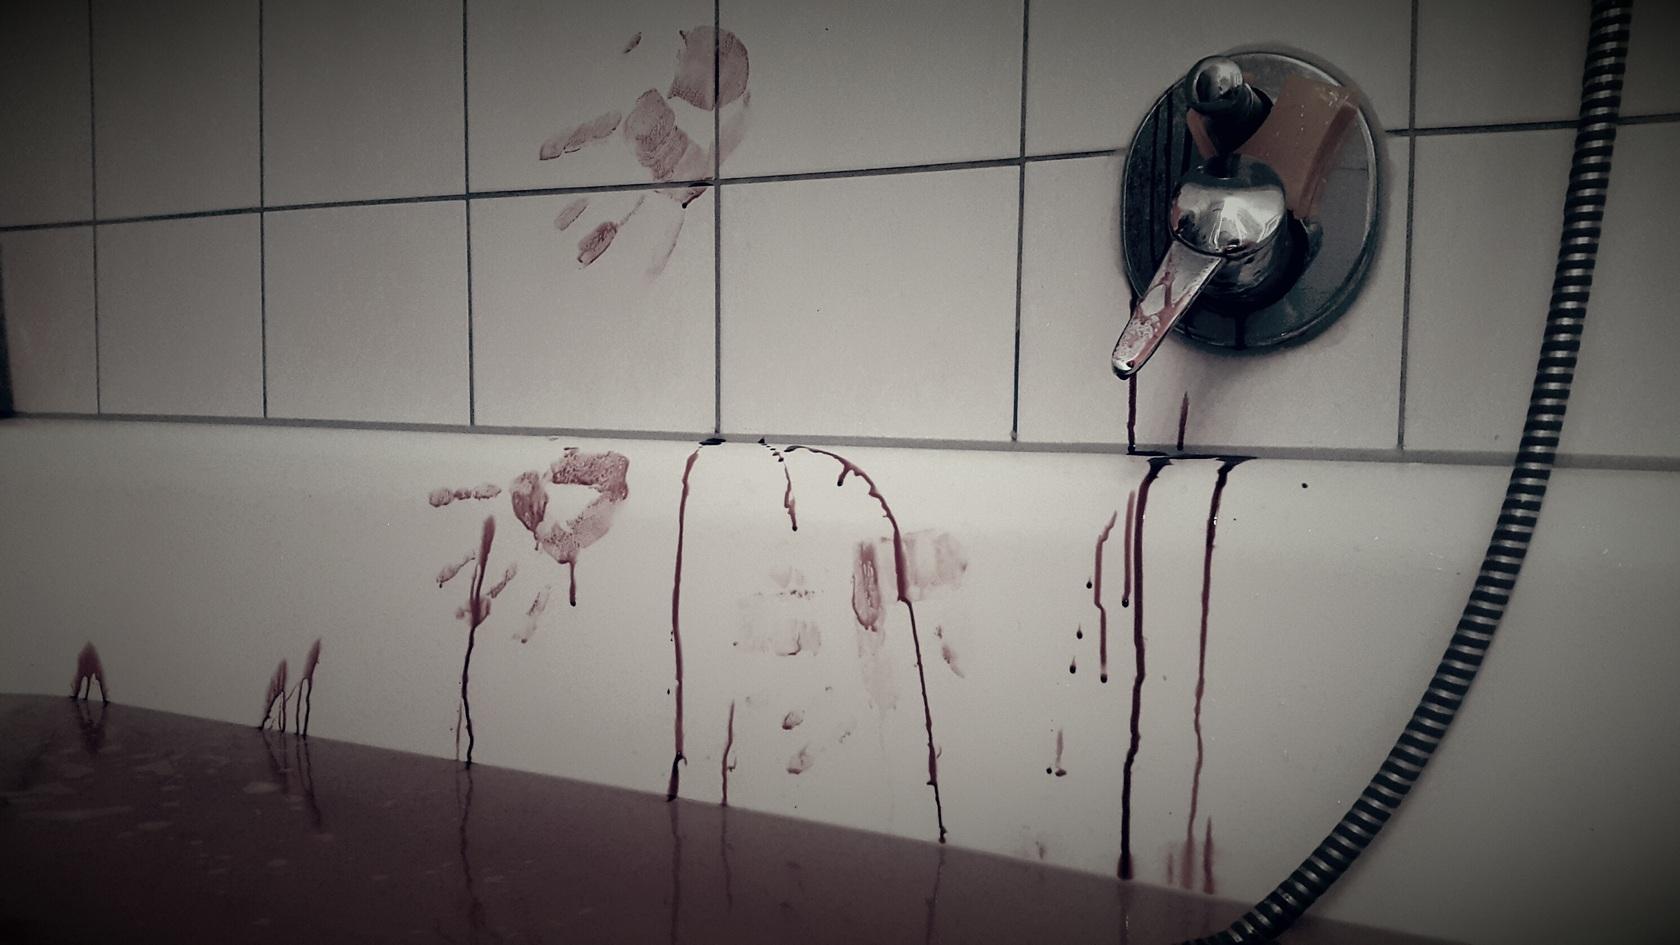 crrimen bañera light-white-red-color-criminal-art-863521-pxhere.com